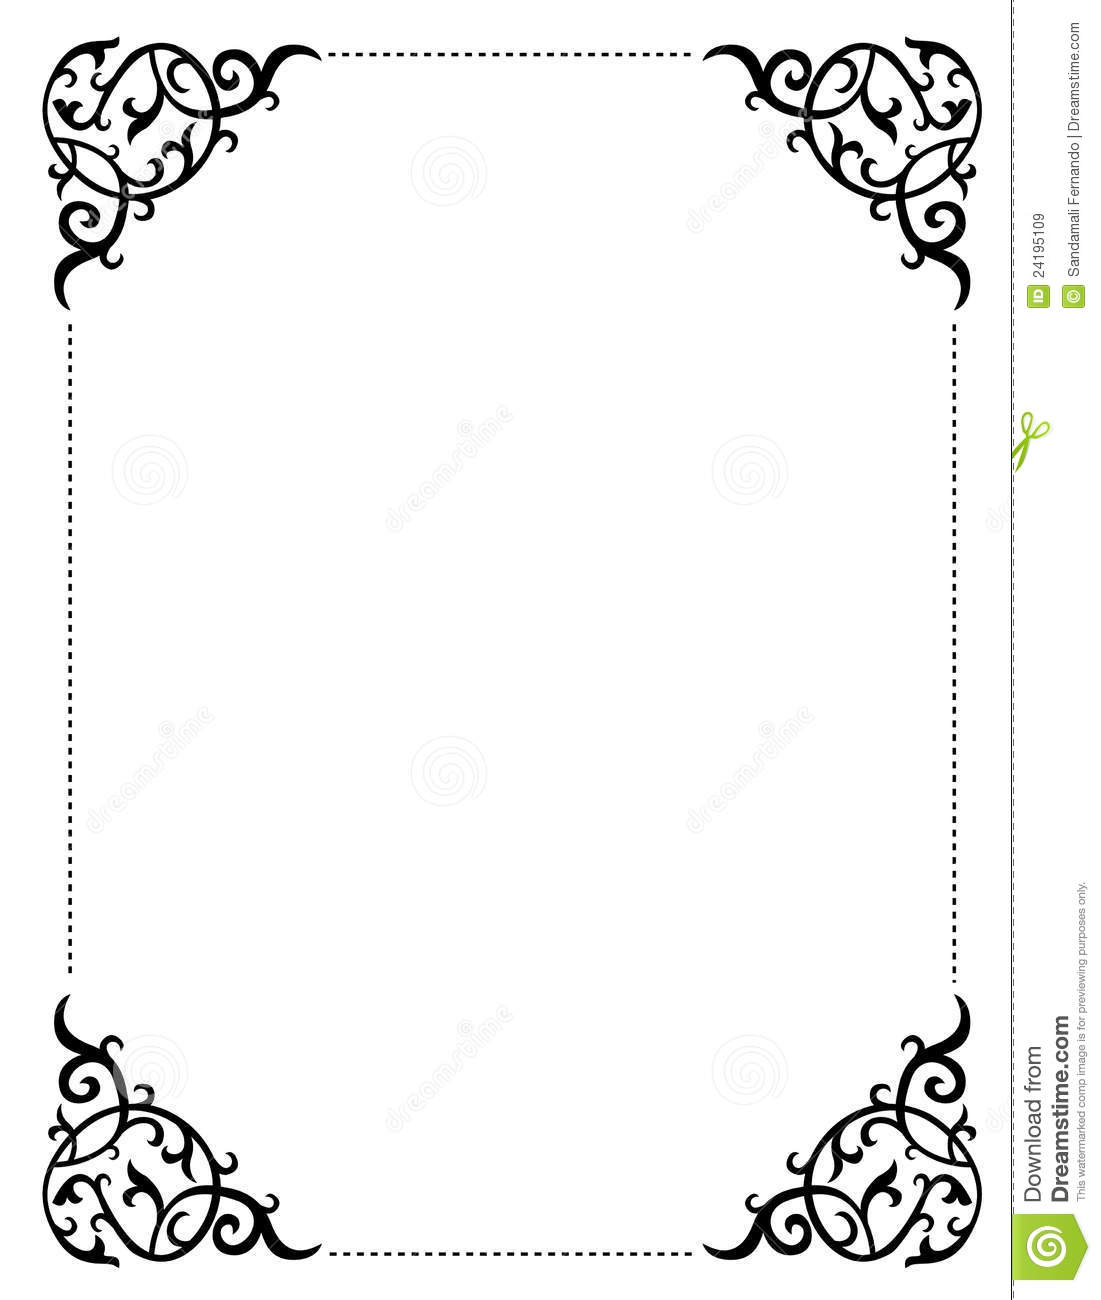 Free Wedding Invitation Borders and Frames